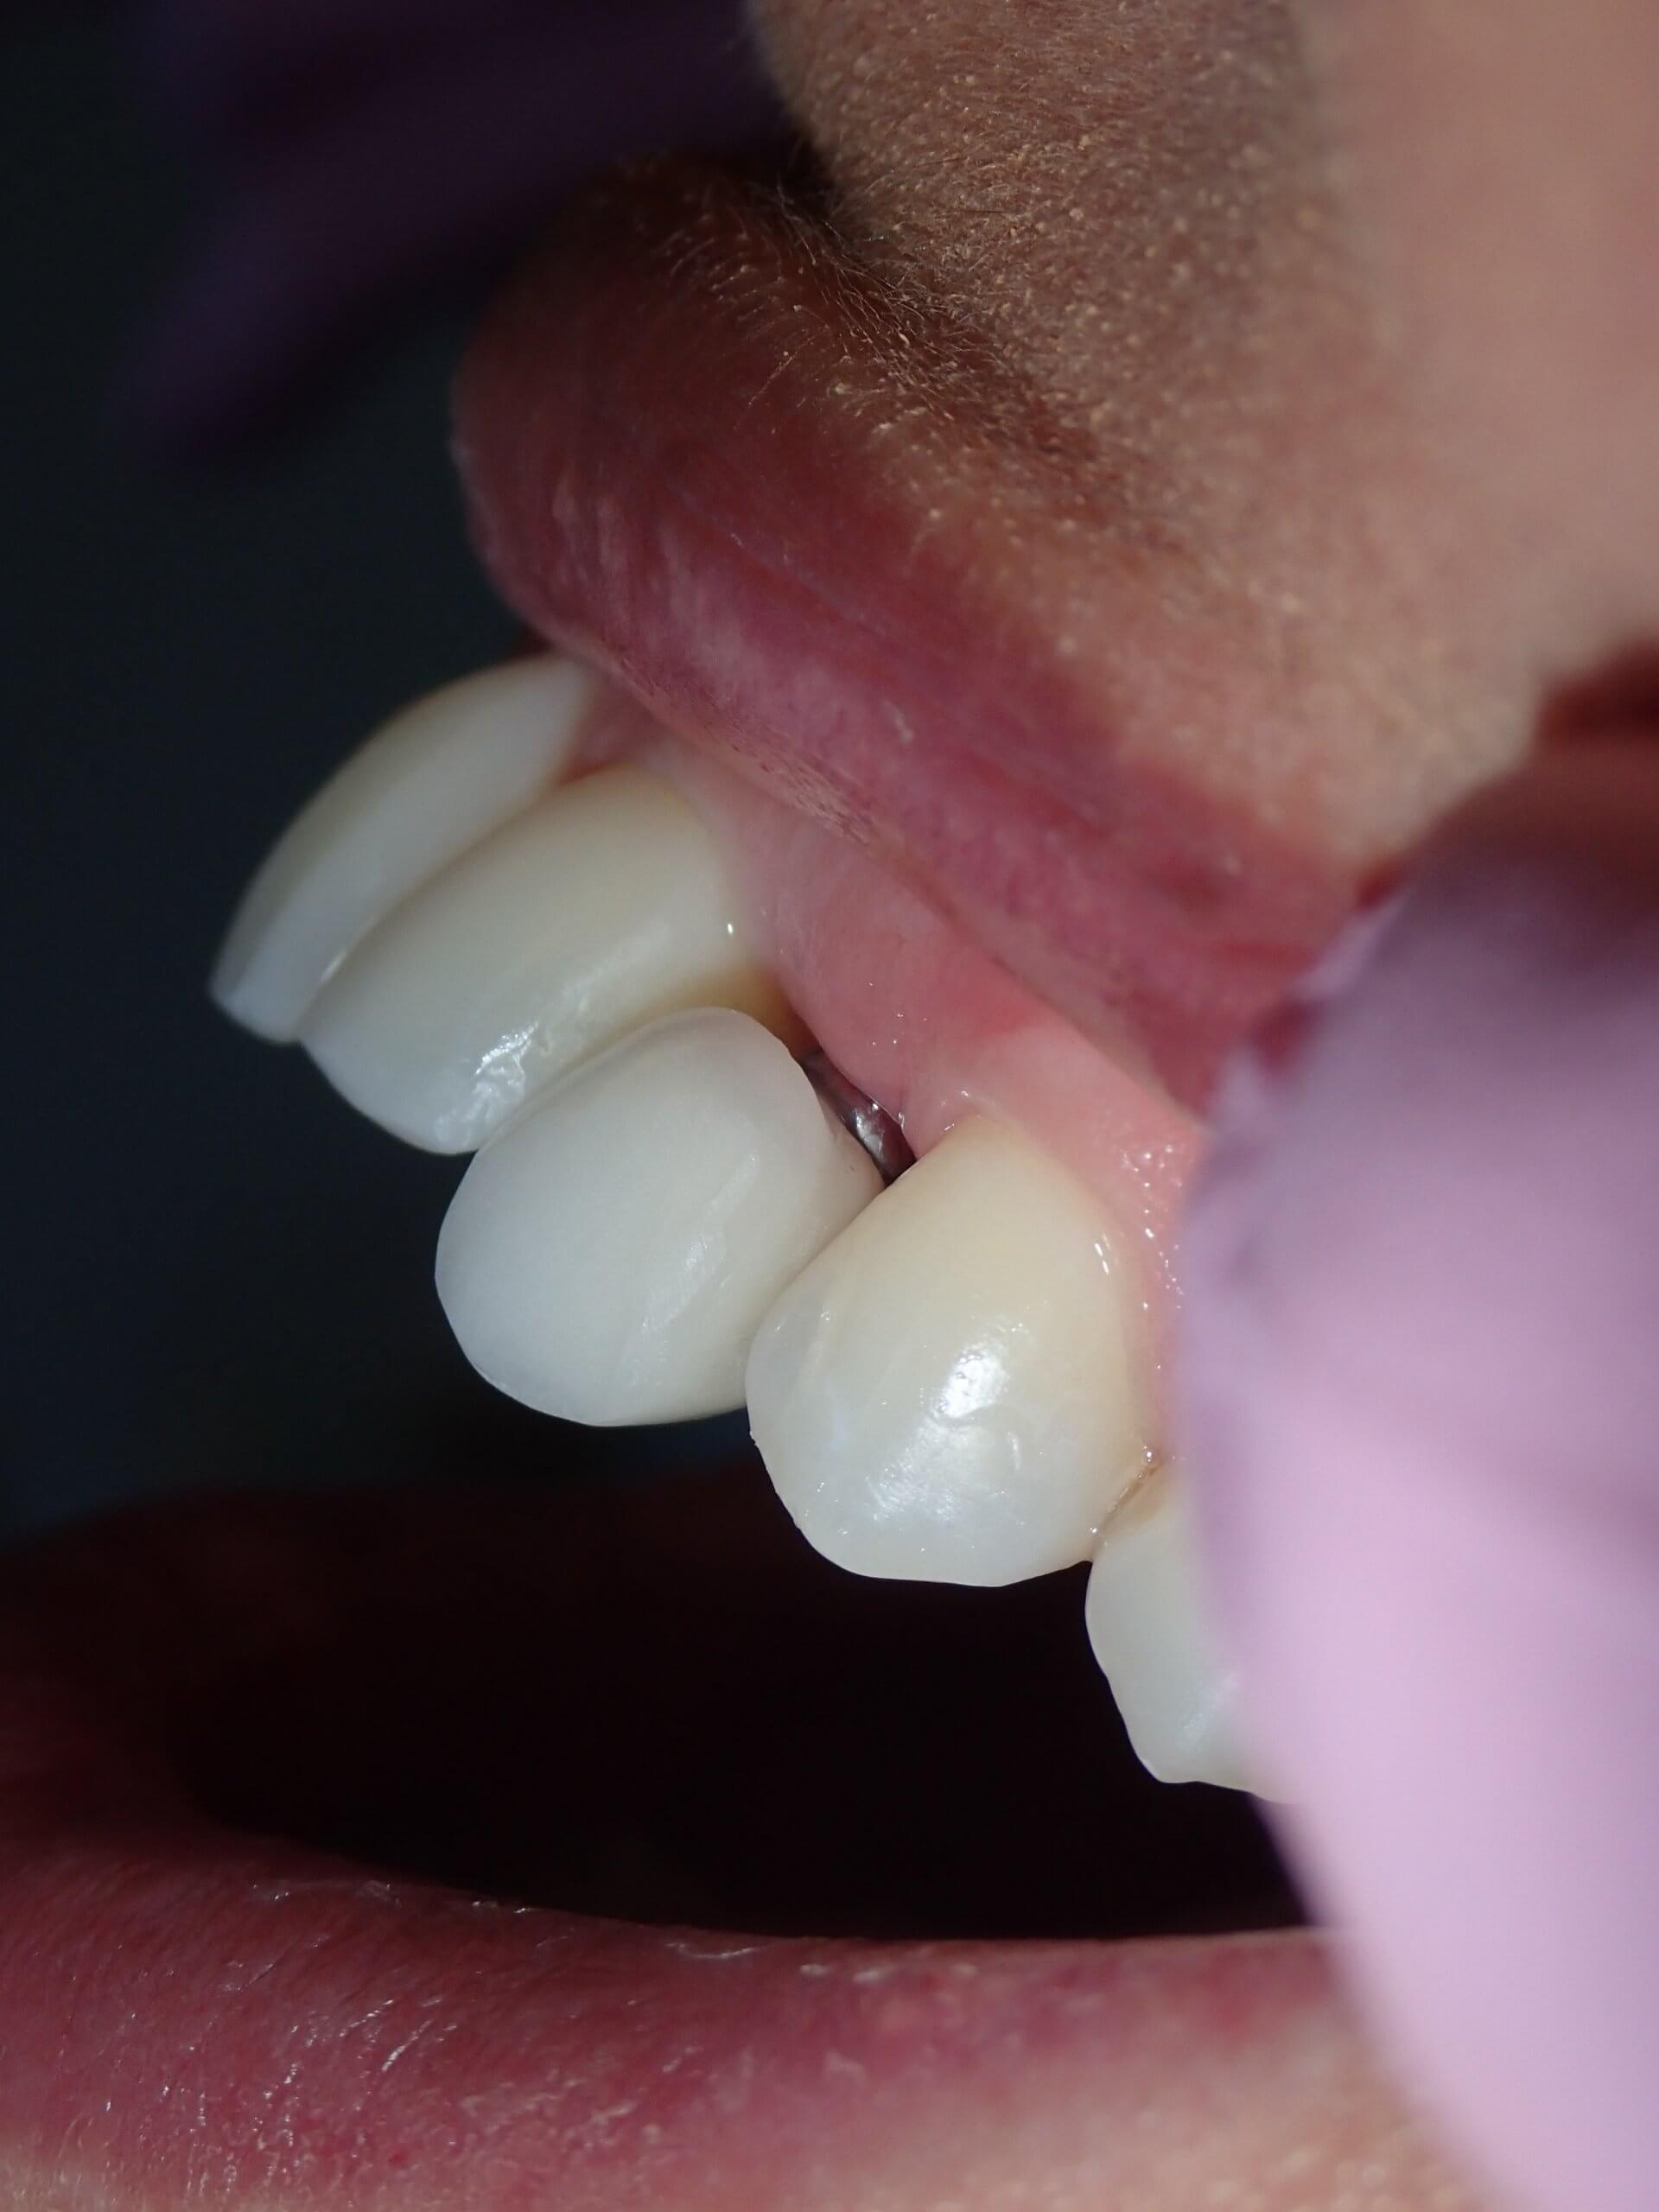 before dental implants 2